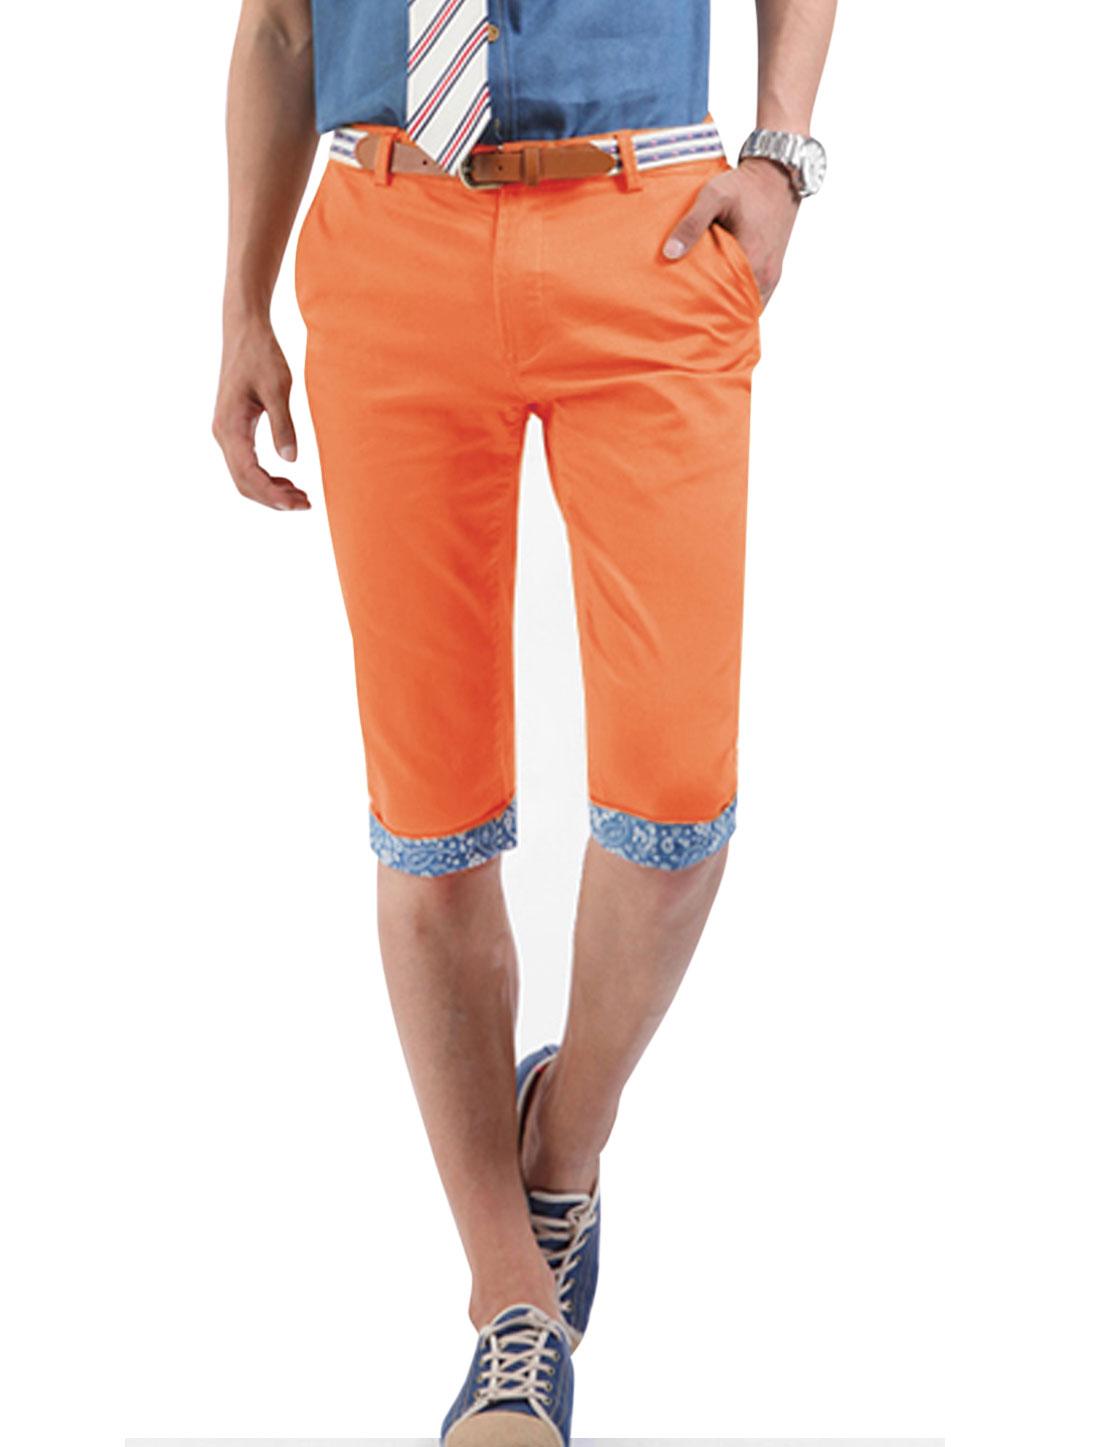 Men Floral Prints Zip Fly Cuffed Slim Fit Half Pants Light Orange W30